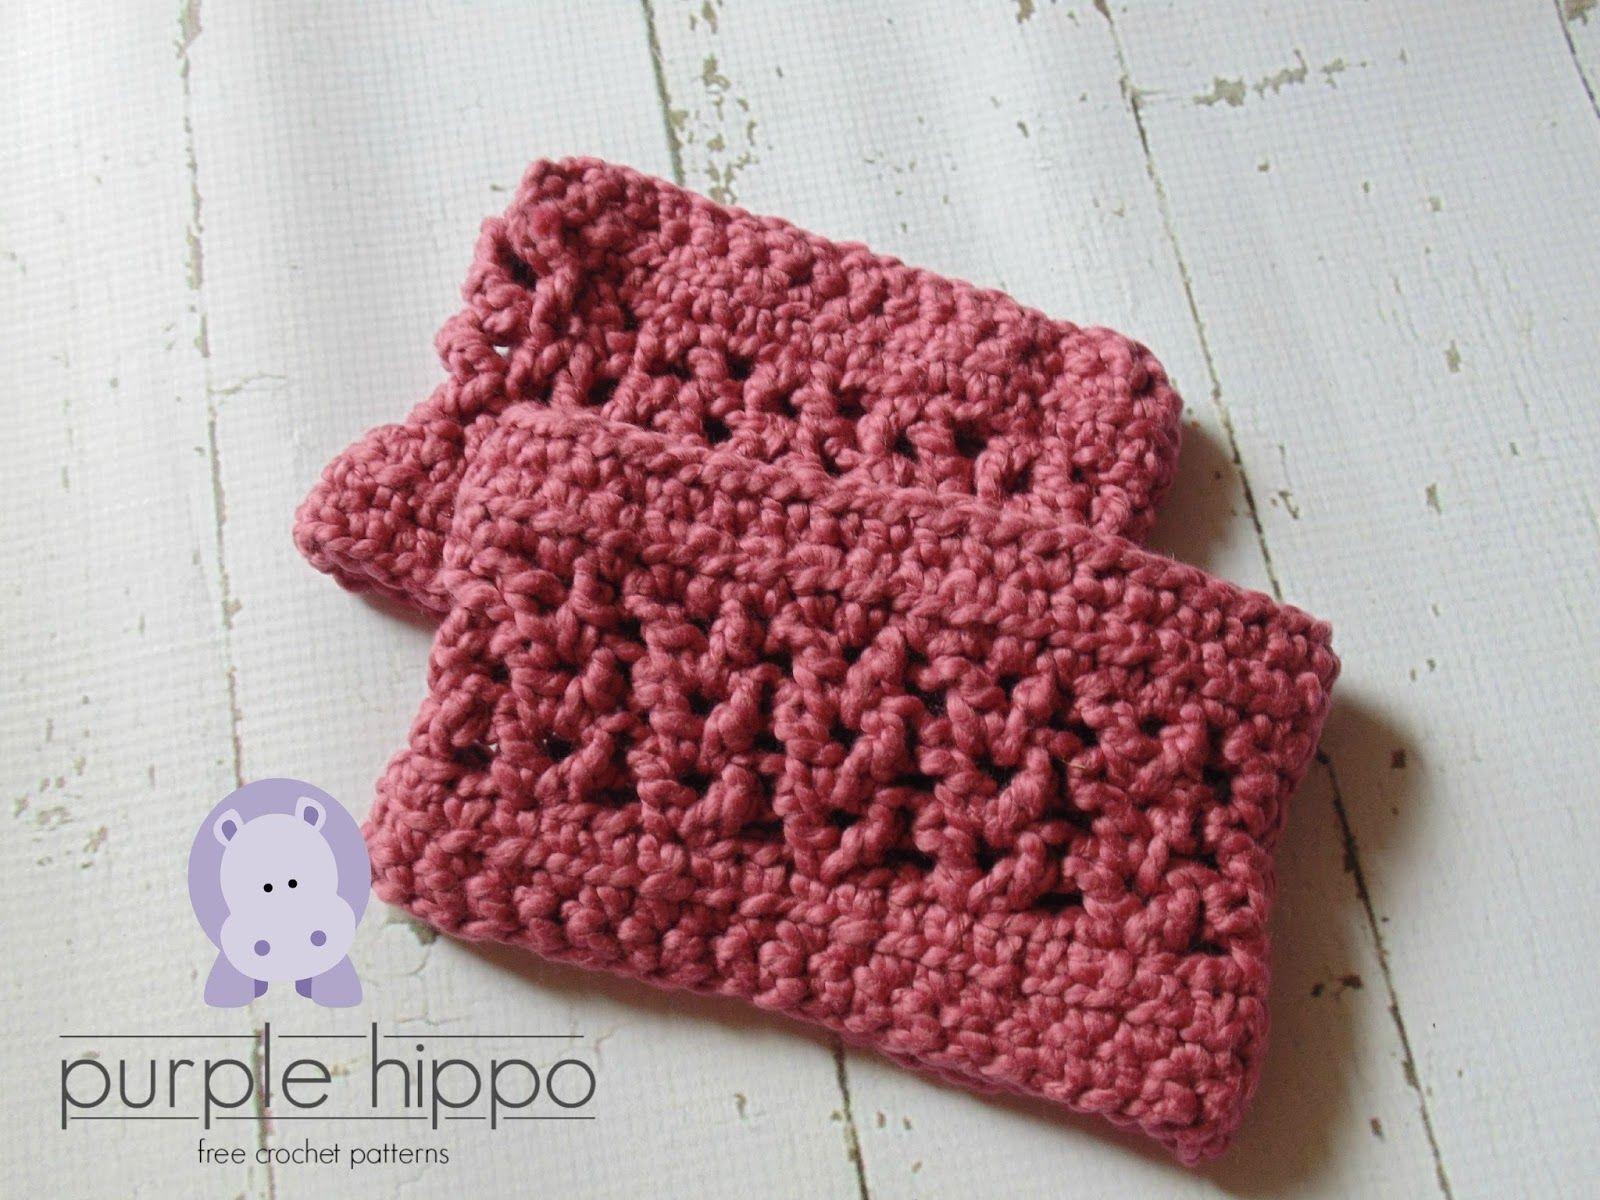 Free crochet pattern, Boot Cuffs, Purple Hippo | Crochet | Pinterest